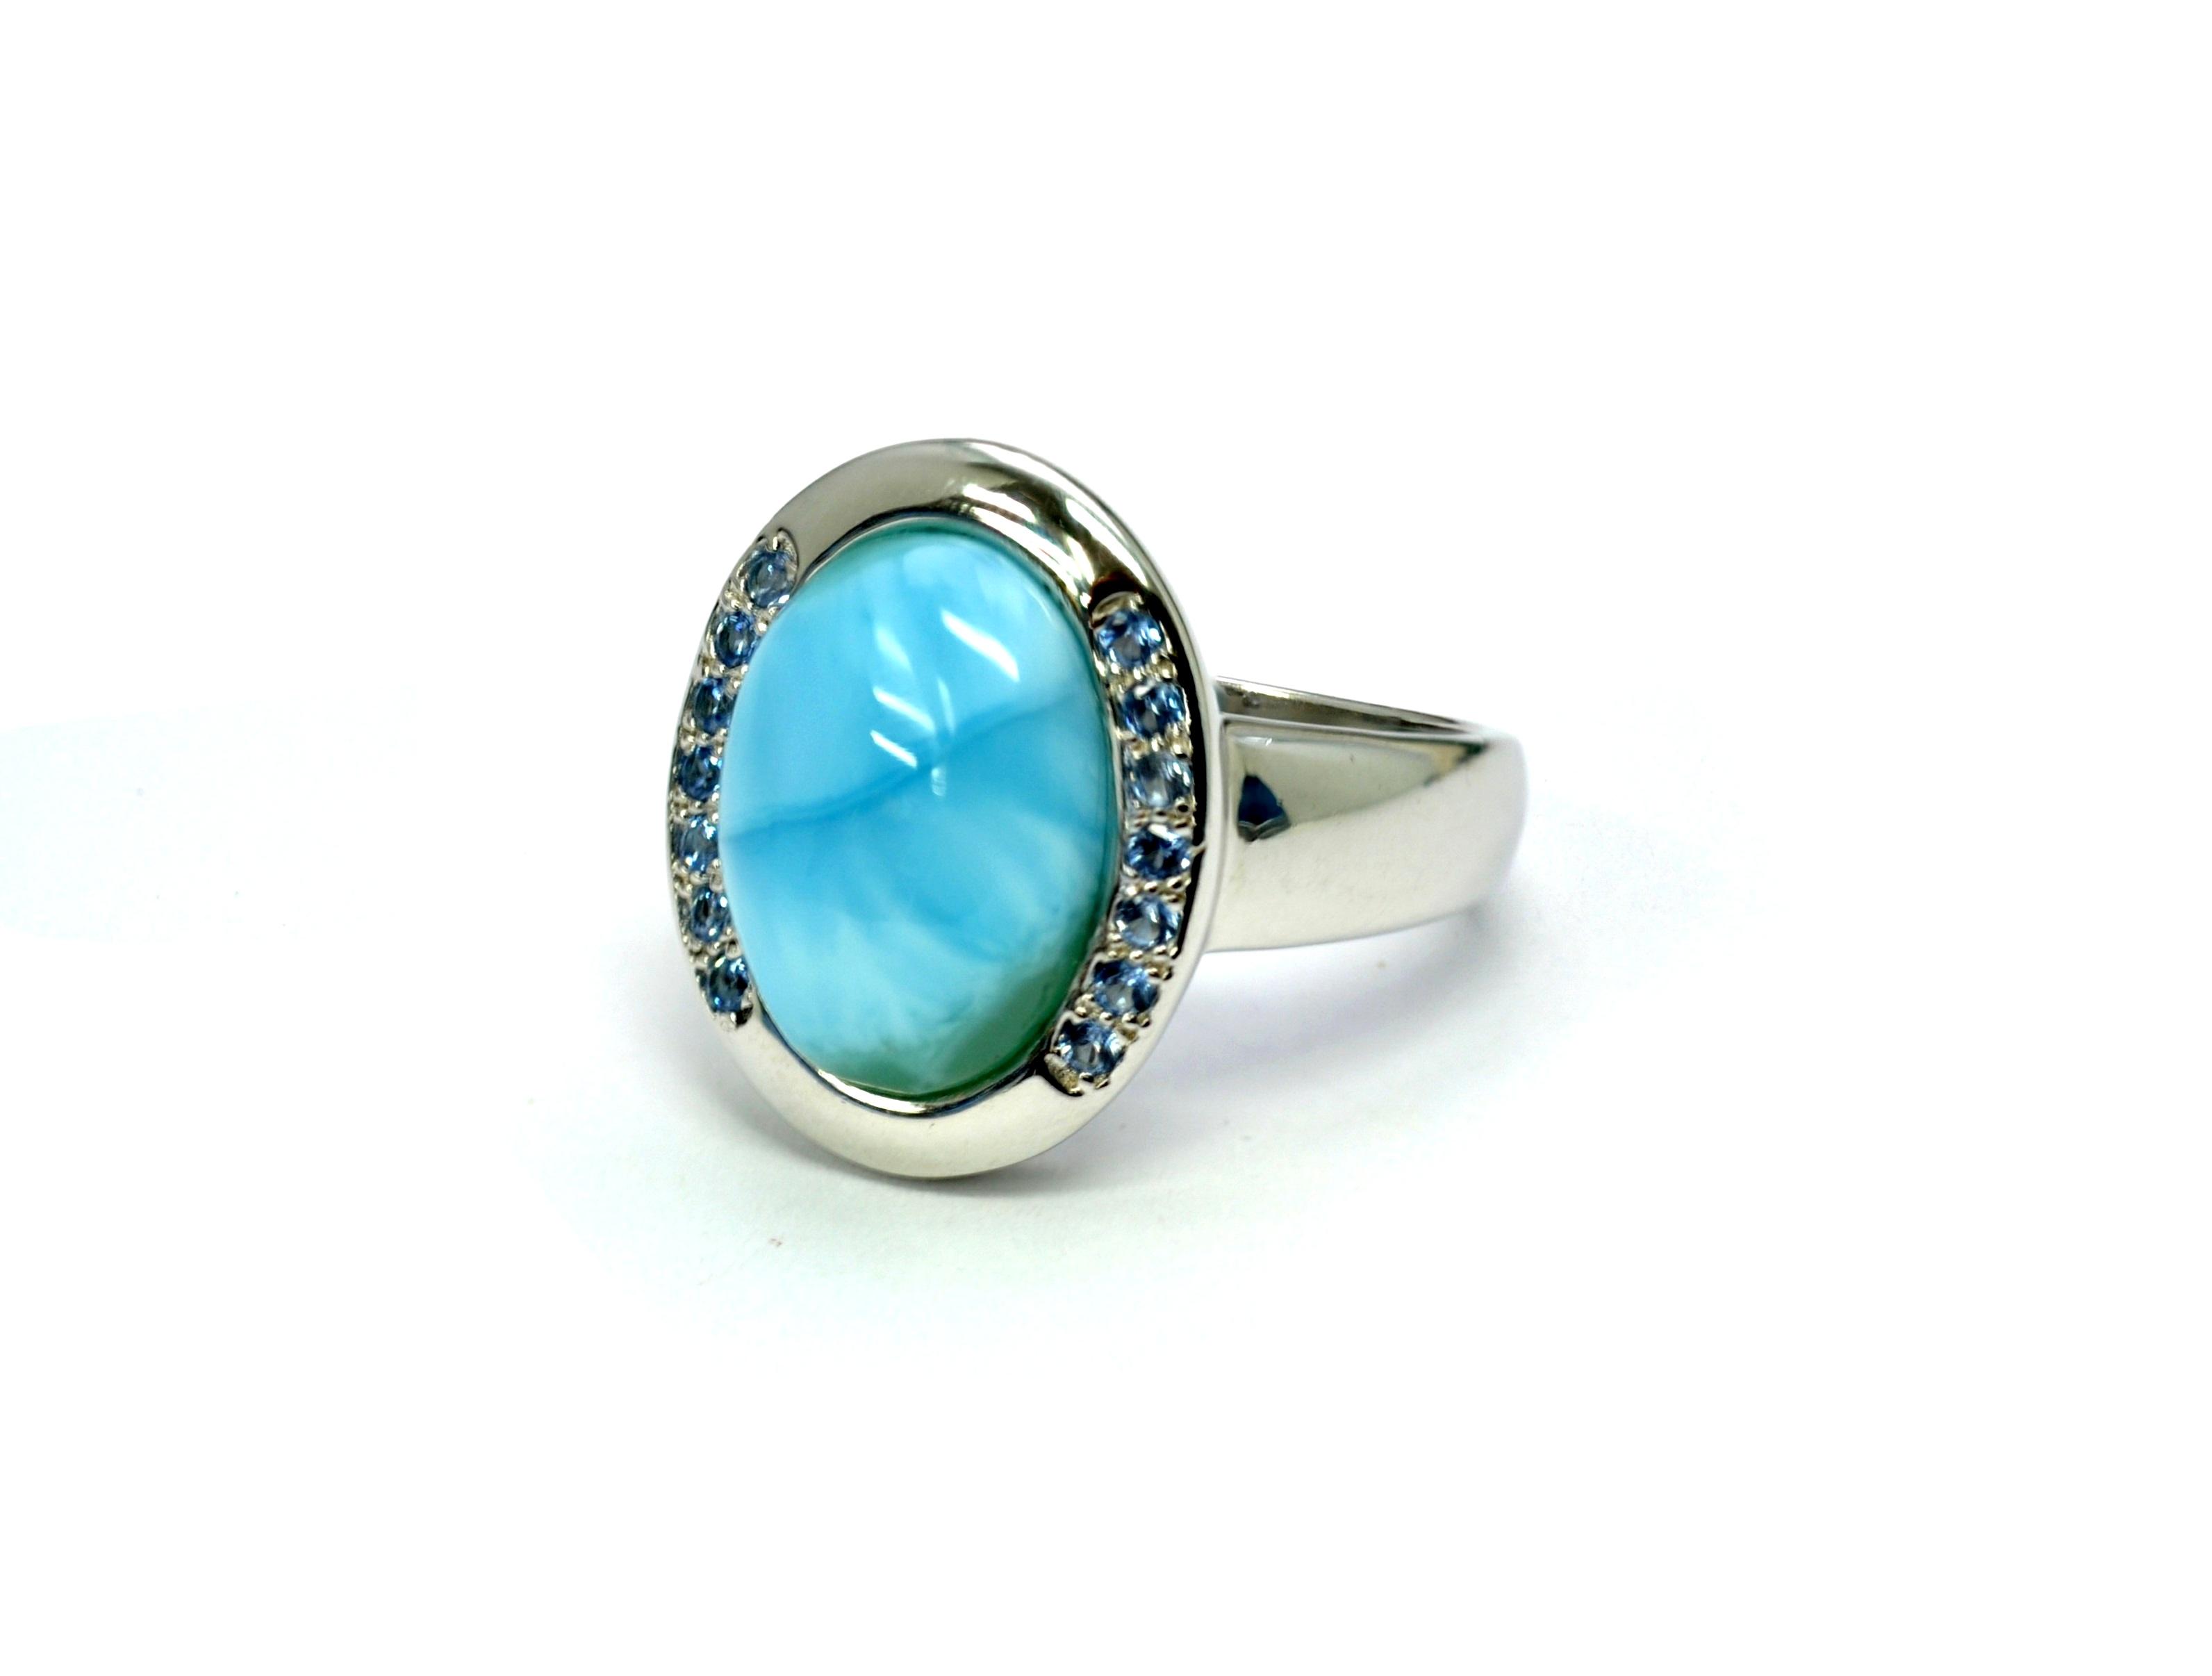 Larimar Aquamarine Combination 14X10mm Sterling Silver designer Ring.size 8.5